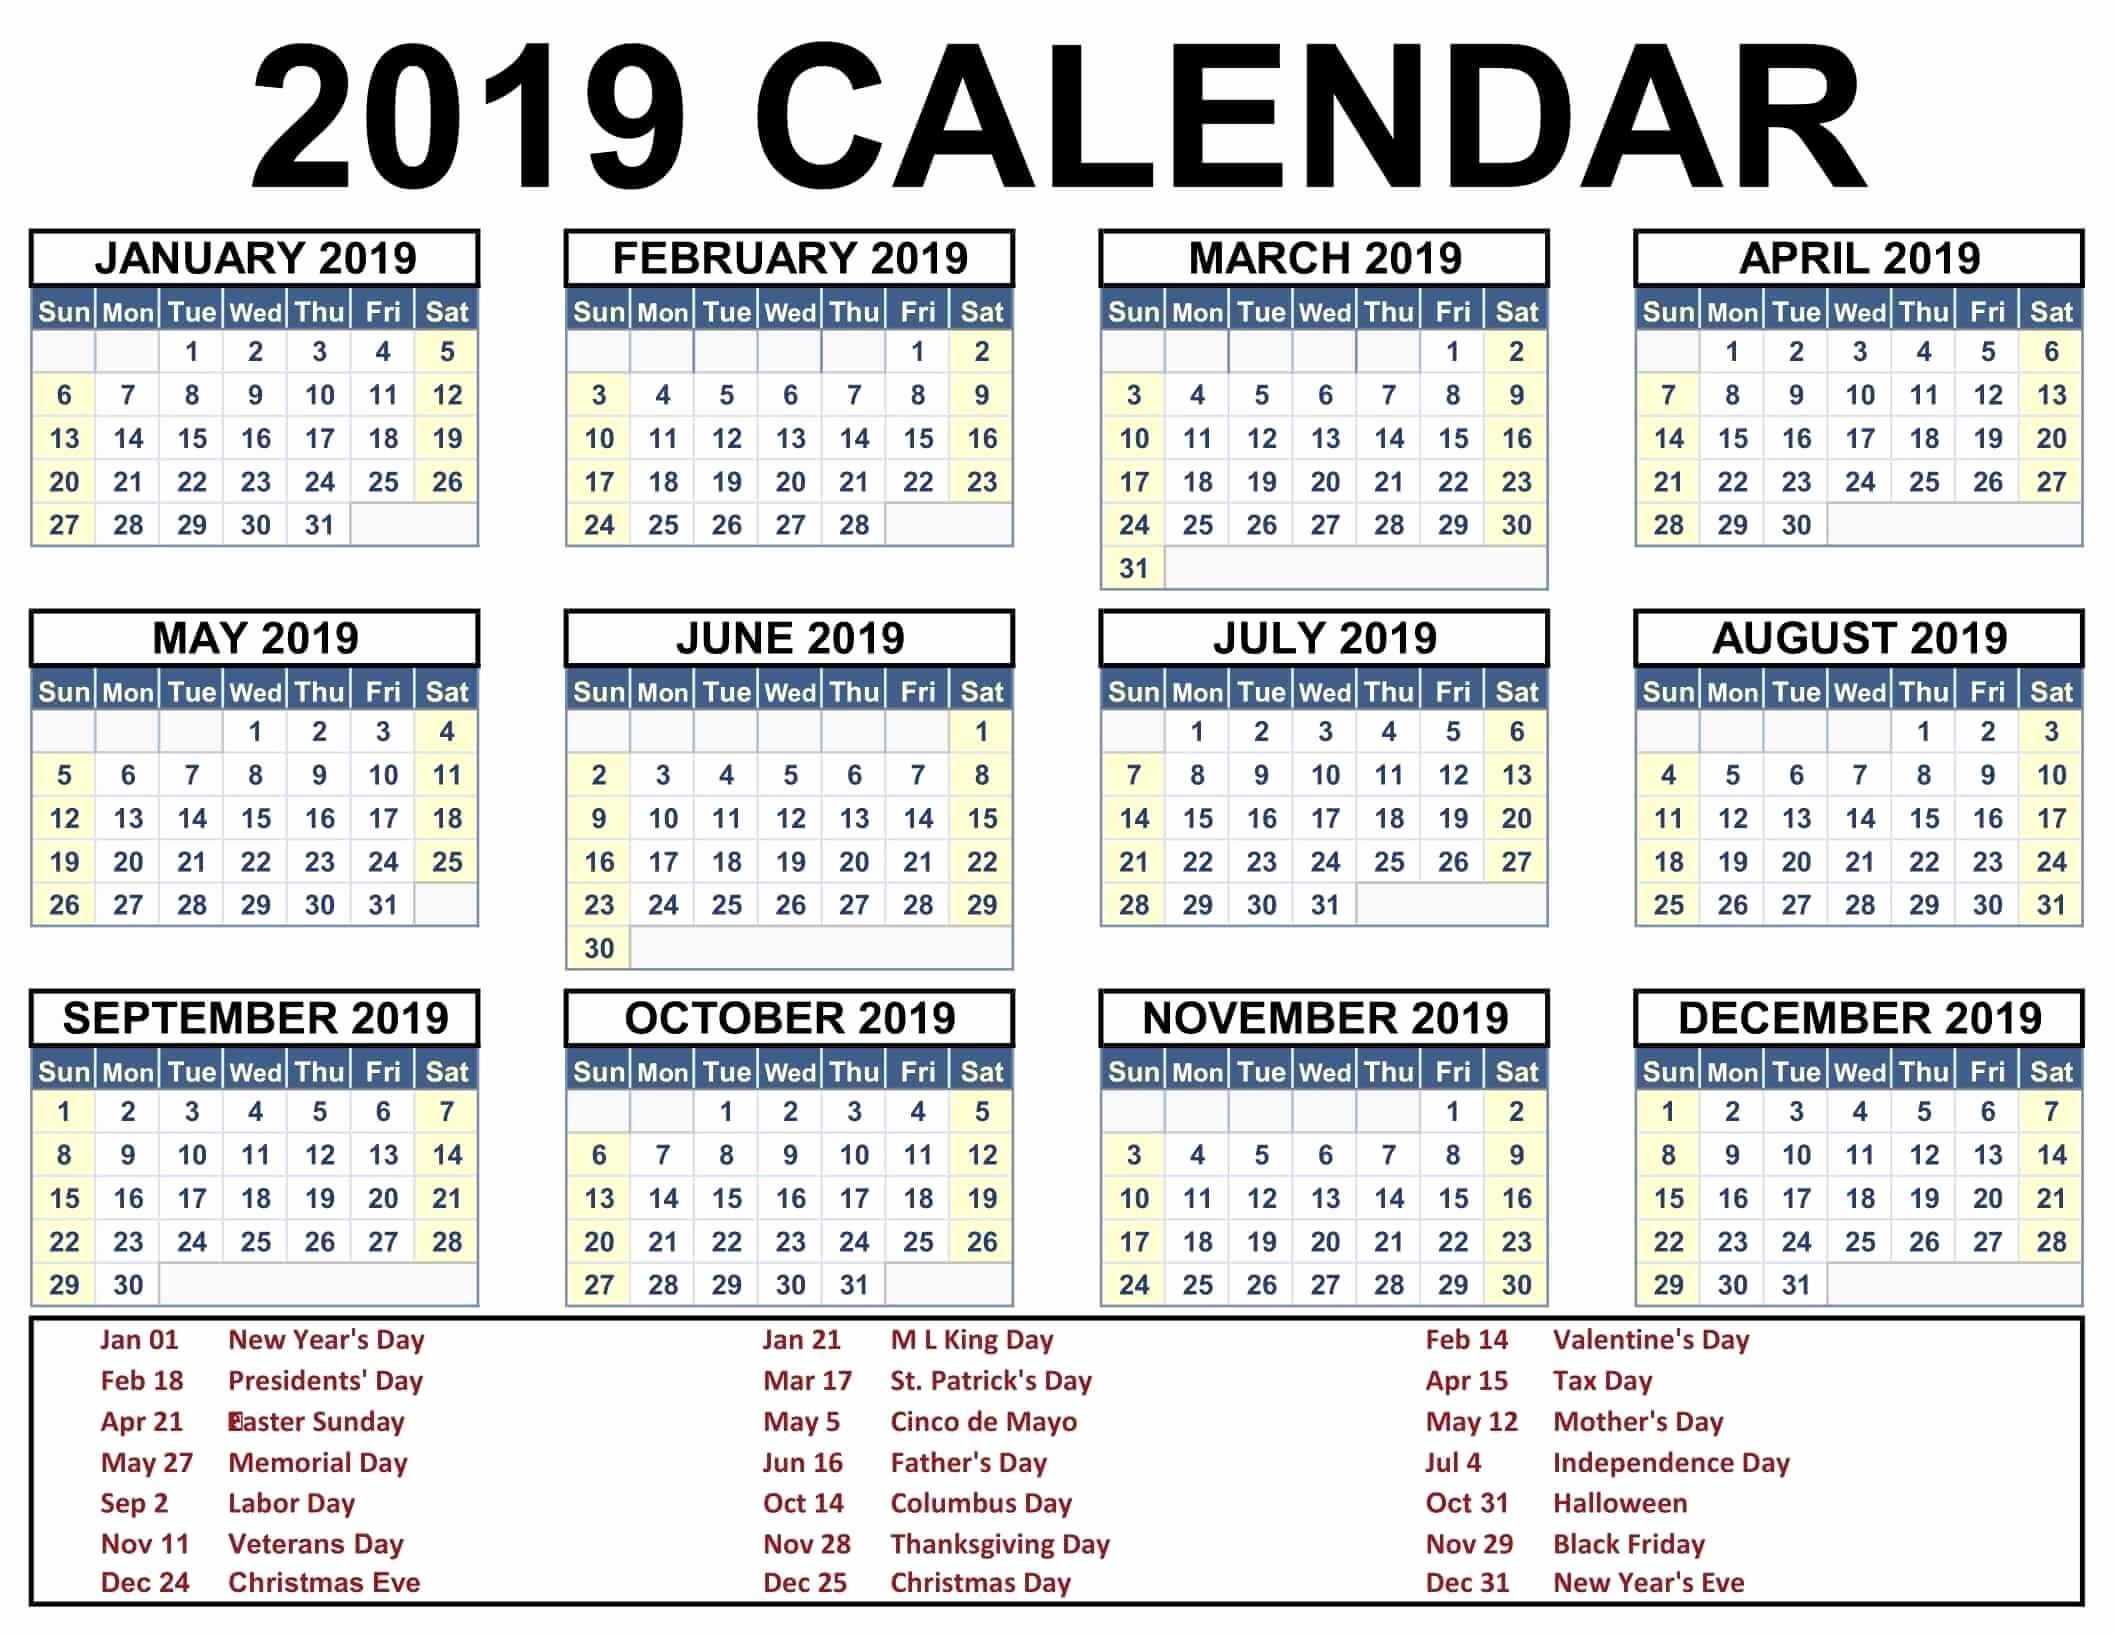 Luxury 32 Examples Hanukkah 2019 2020 Calendar   Etxettipia regarding Ewish Calendar 2019 - 2020